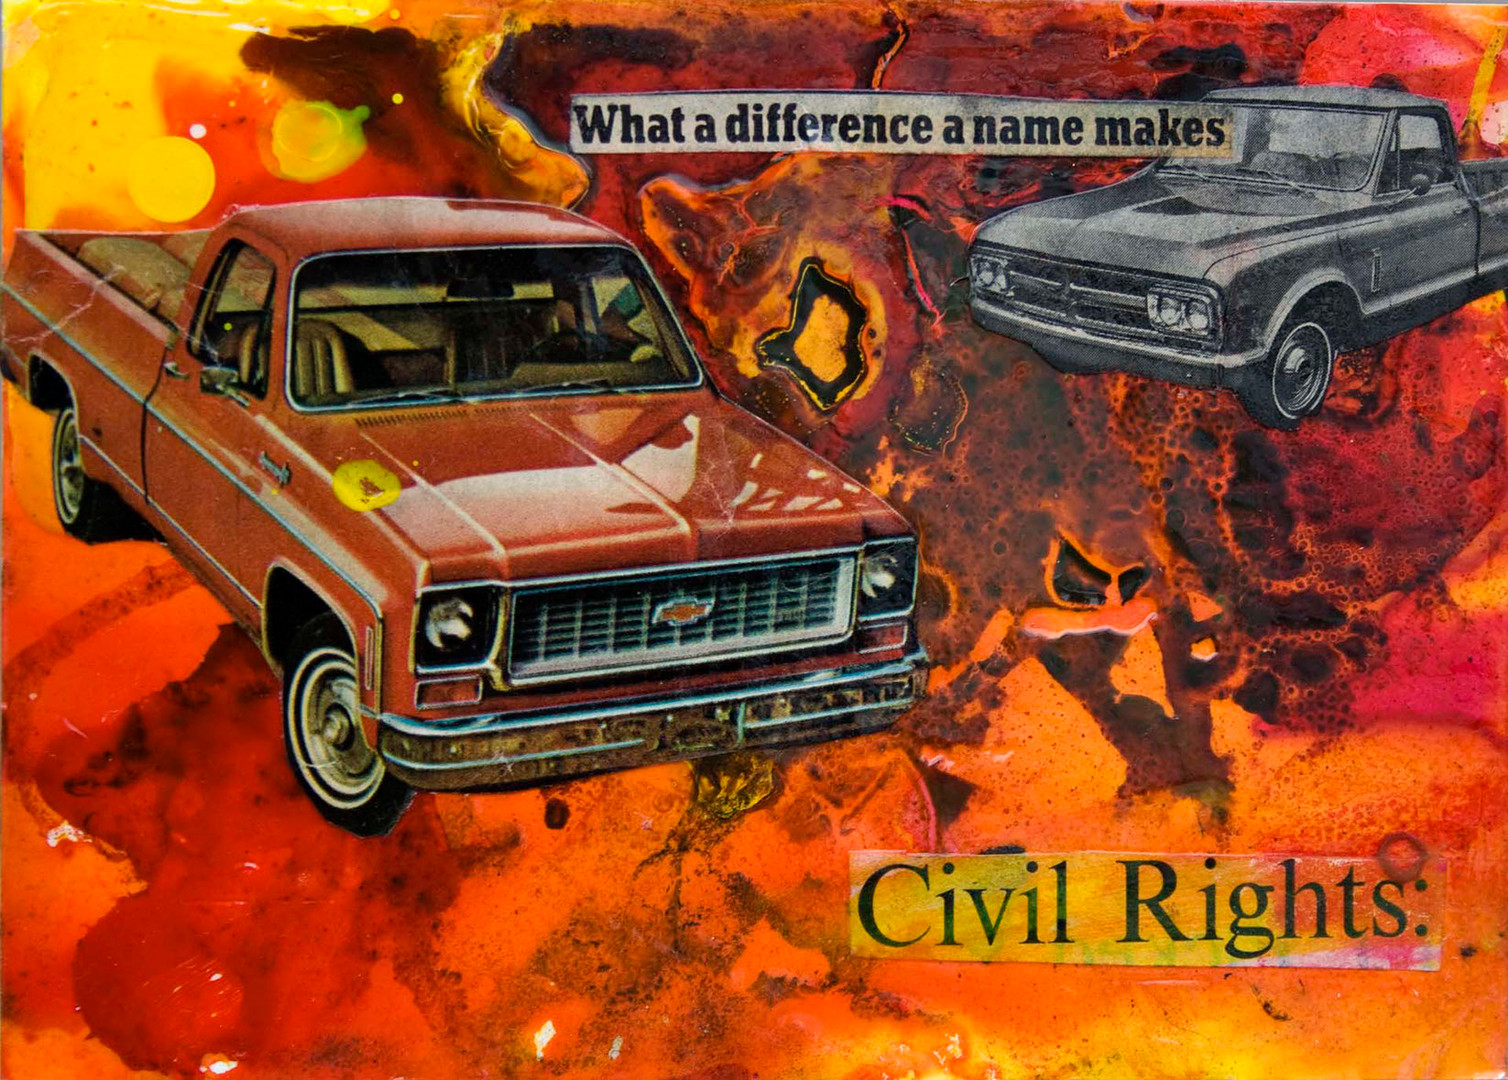 5x7 civi rights.jpg